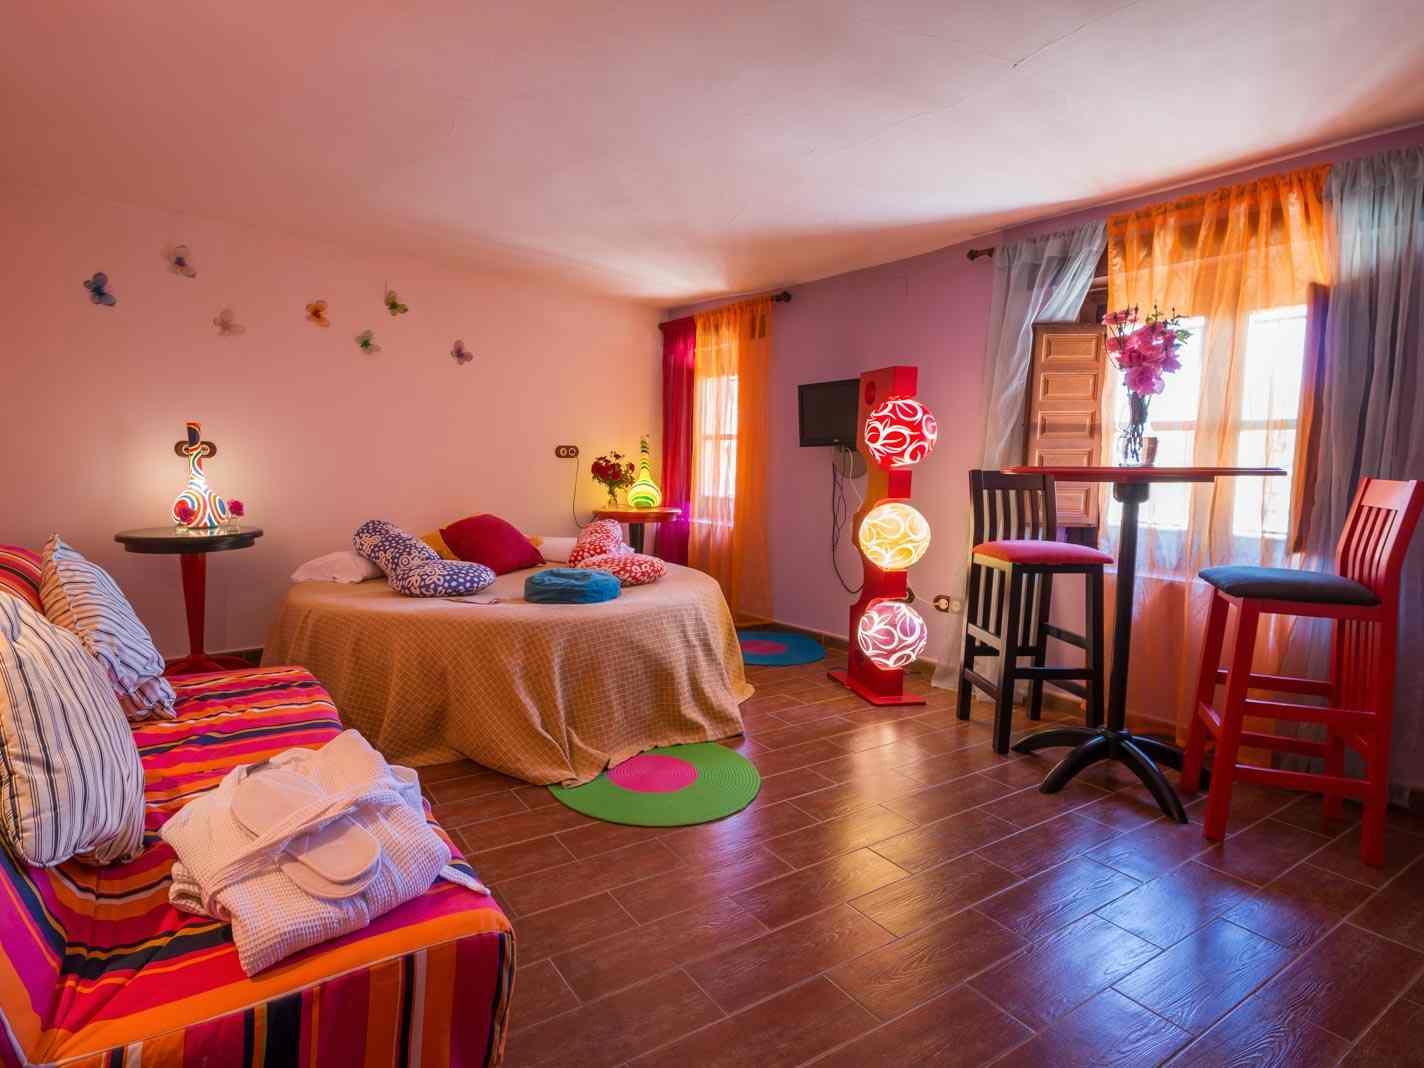 Hospedium Hotel La Casa del Canónigo